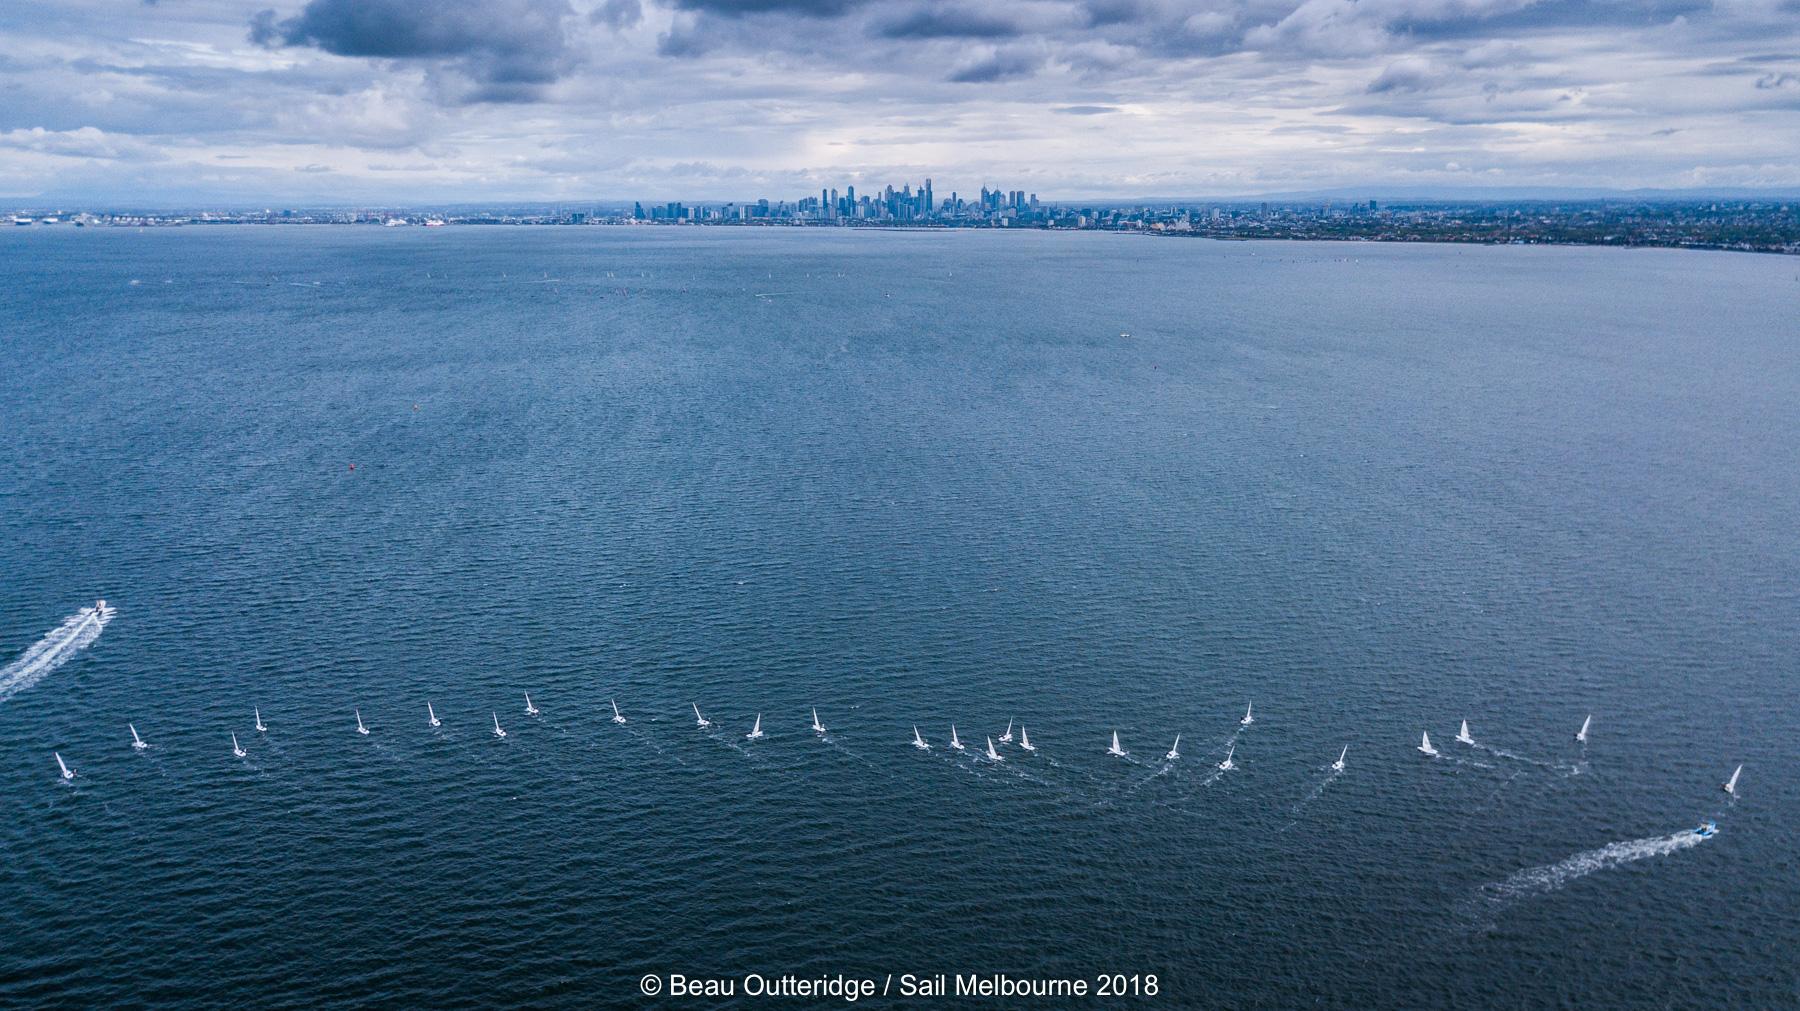 Sail Melbourne 2018. Photo Beau Outteridge.